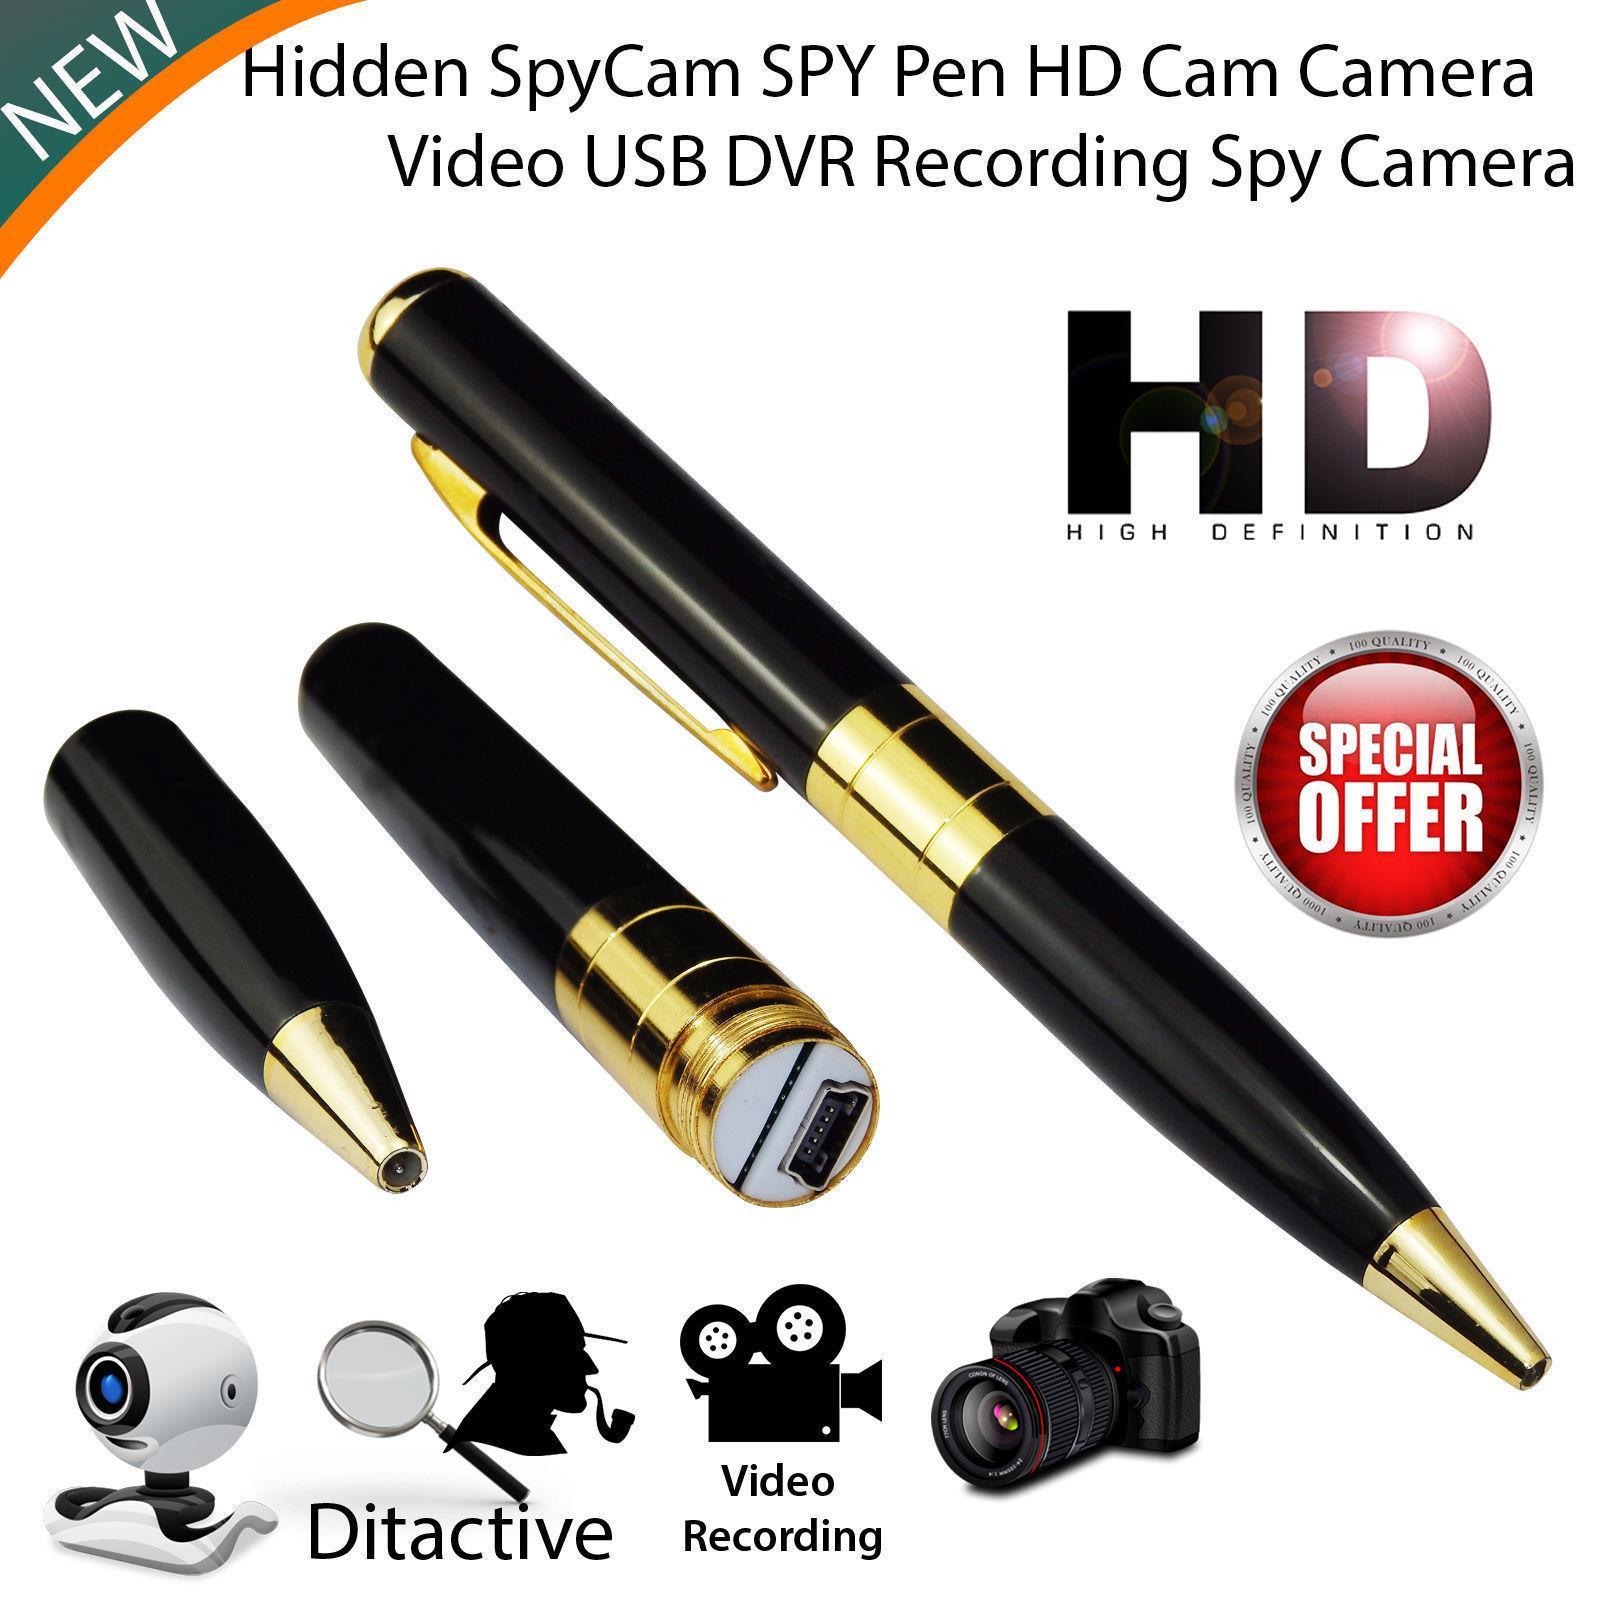 Jual Hidden Cam Kamera Mini Kancing Baju Spy Camera Hd Pulpen Bolpen Tersembunyi Pengintai Hq Bpr 6 Video Recorder